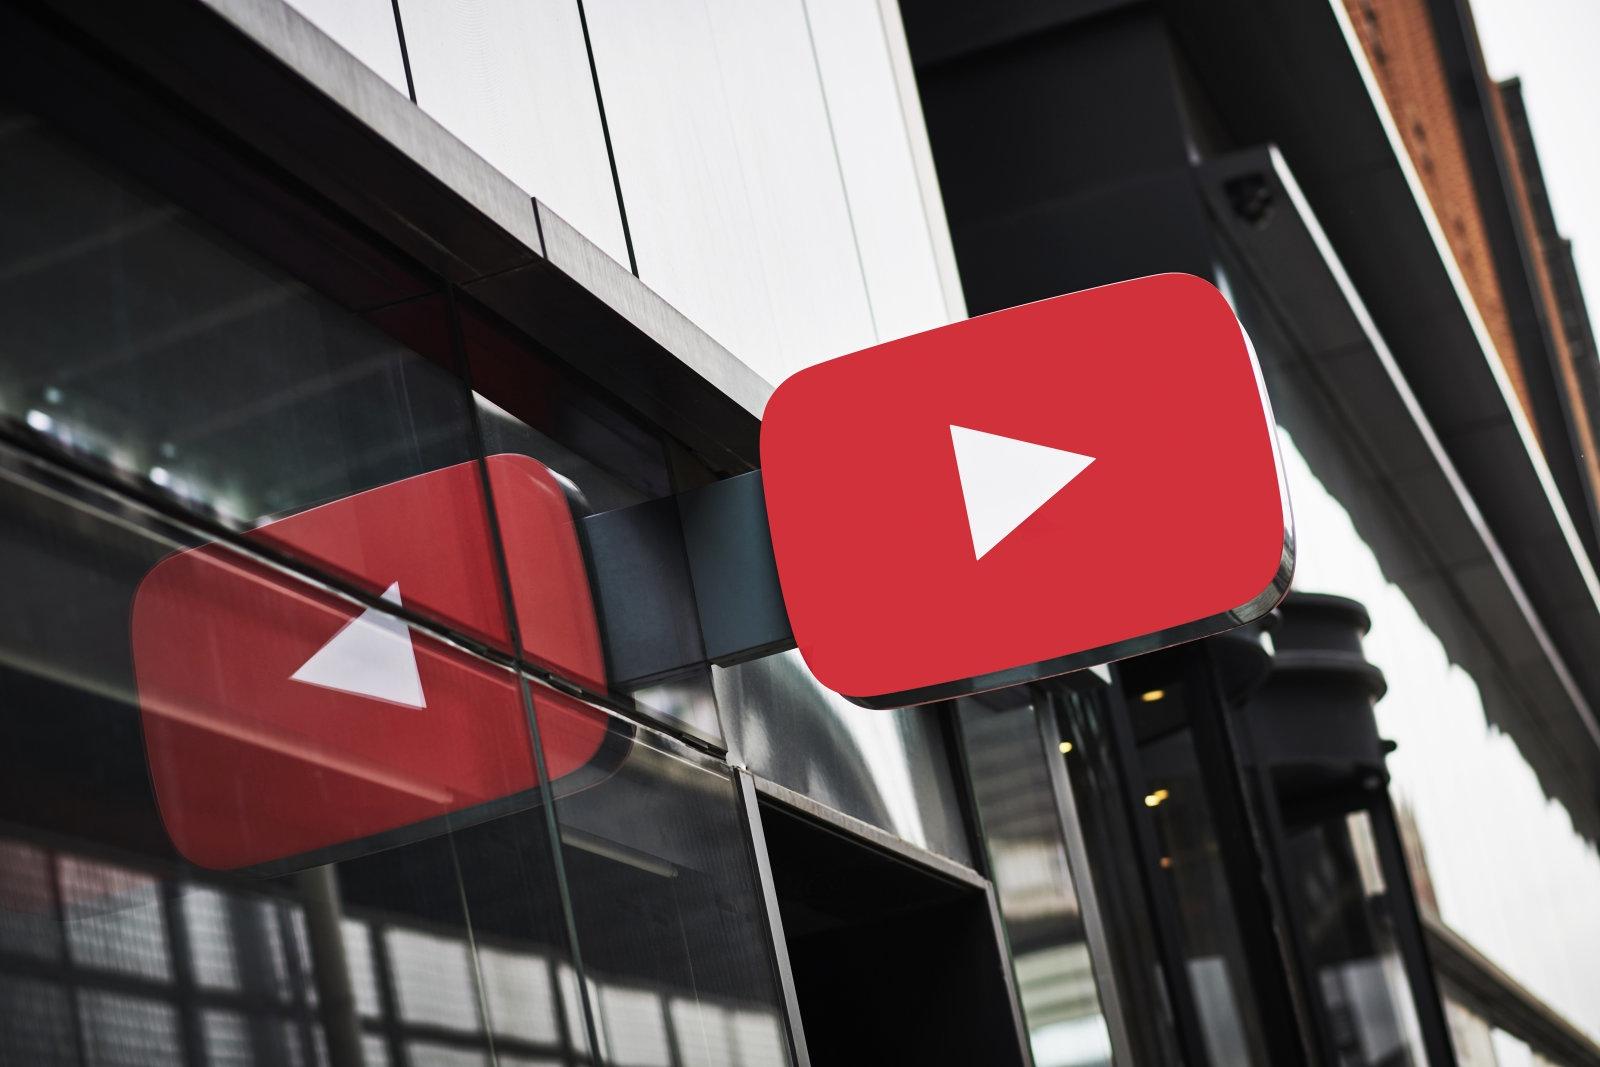 youtube-showtime-gibi-premium-abonelikler-icin-harekete-gecti-1